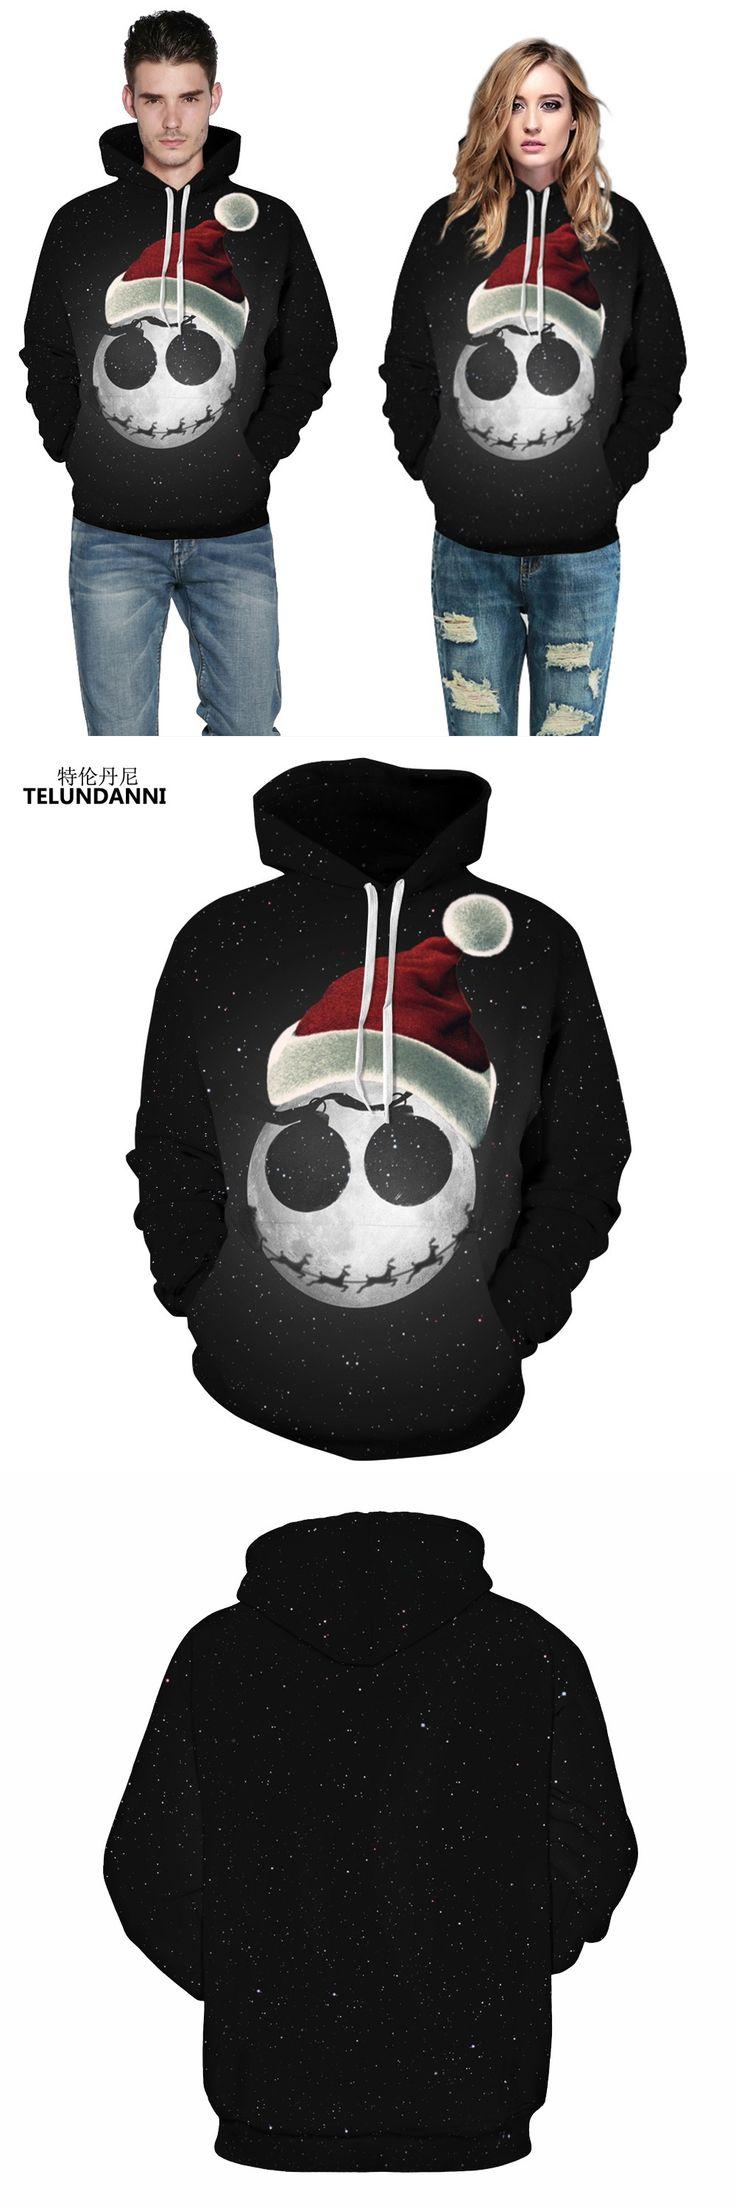 TELUNDANNI Fashion Star Sky Christmas Hat Printed 3d Hoodies Men Hooded Casual Sweatshirt Couple Tracksuit Tops